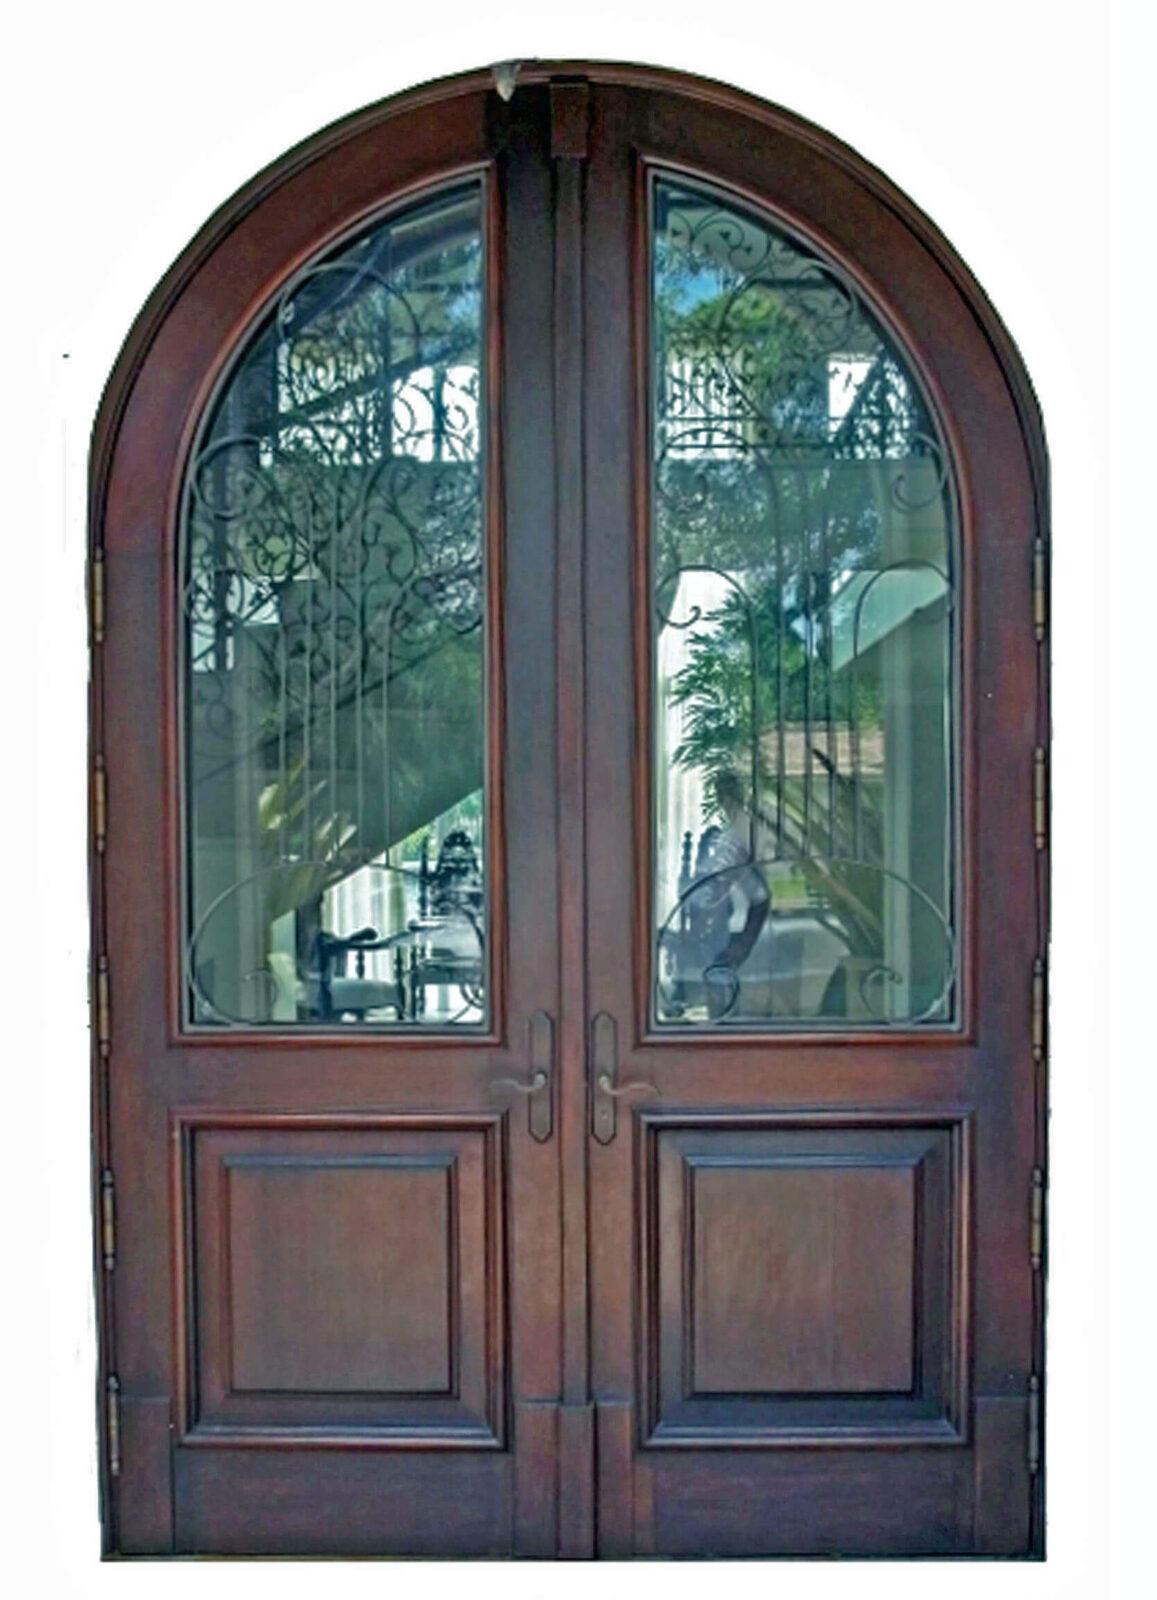 SOUTHWEST RANCHES. MAHOGANY ENTRANCE DOORS.